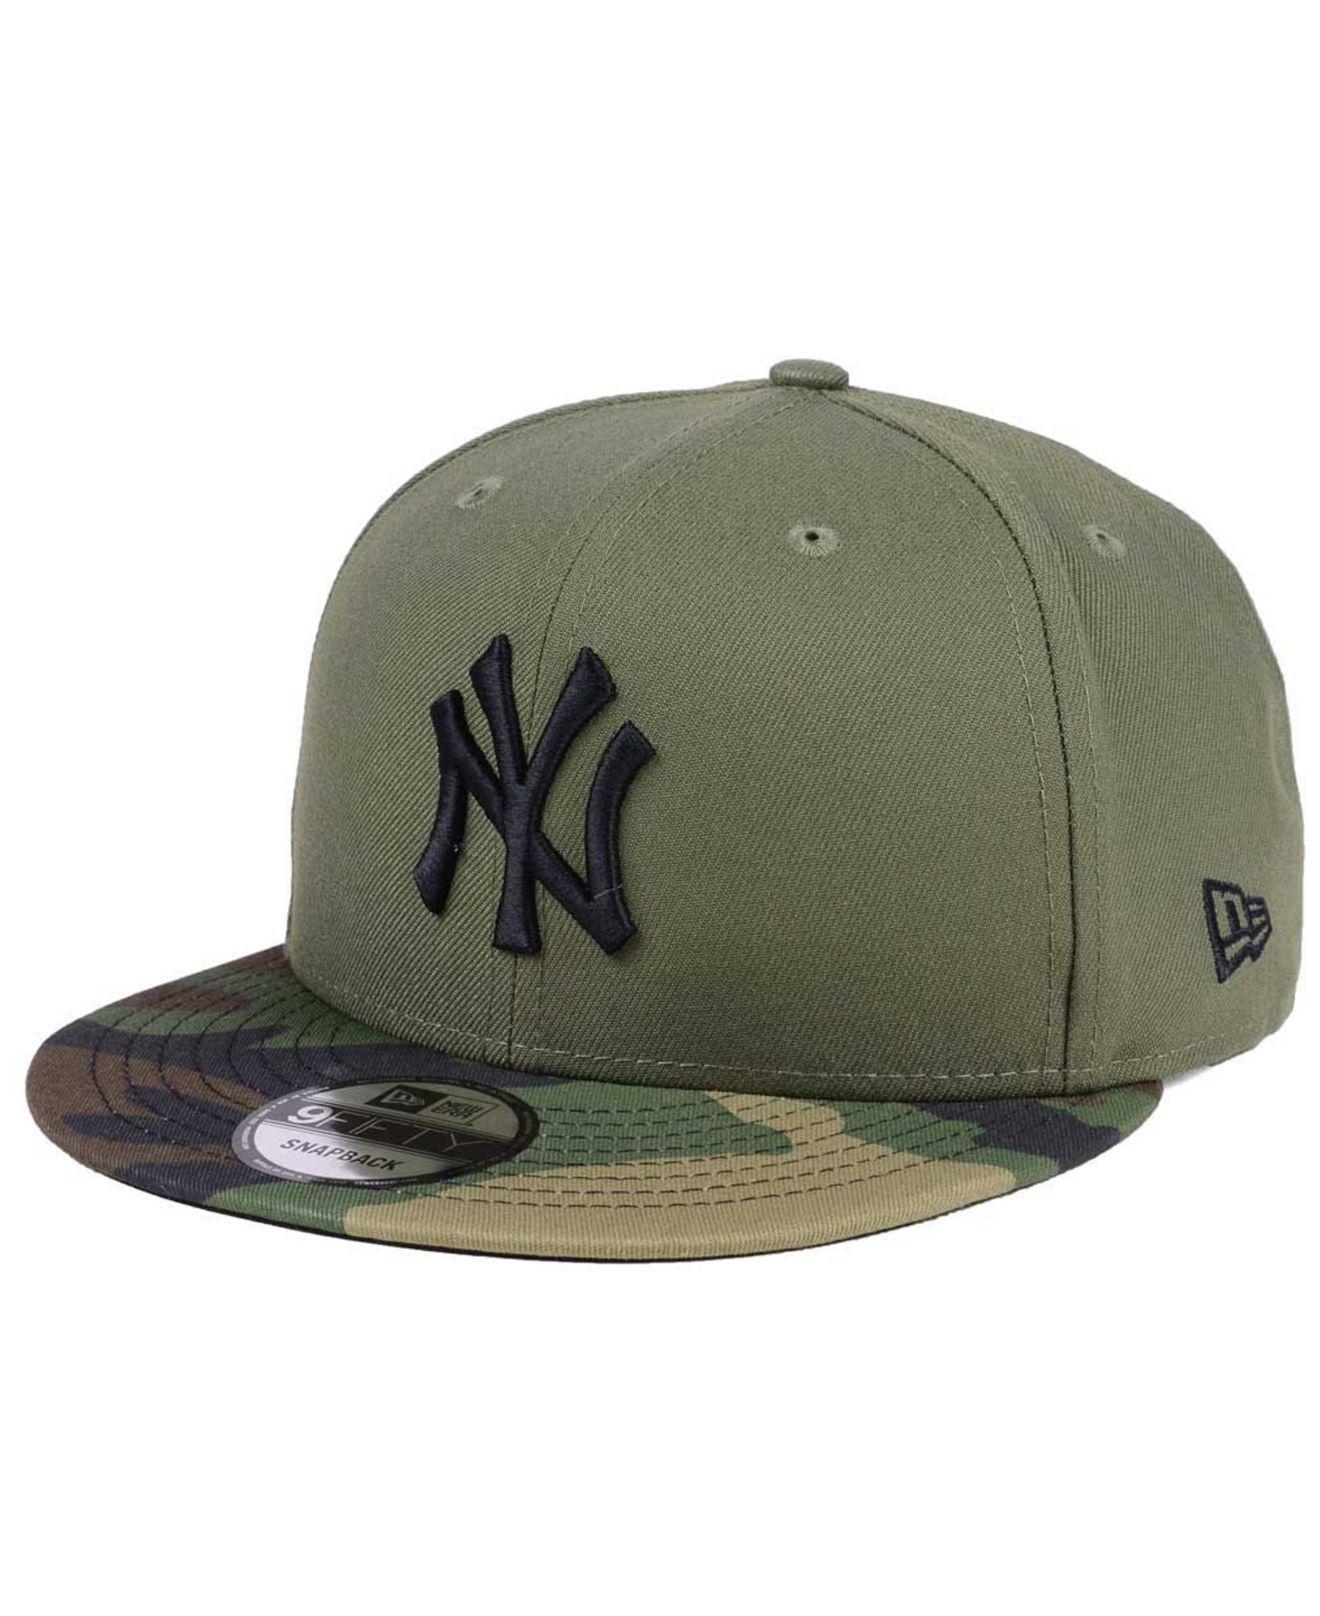 sale retailer 7bbdc 9ca6b KTZ. Men s Green Woodland Black white 9fifty Snapback Cap